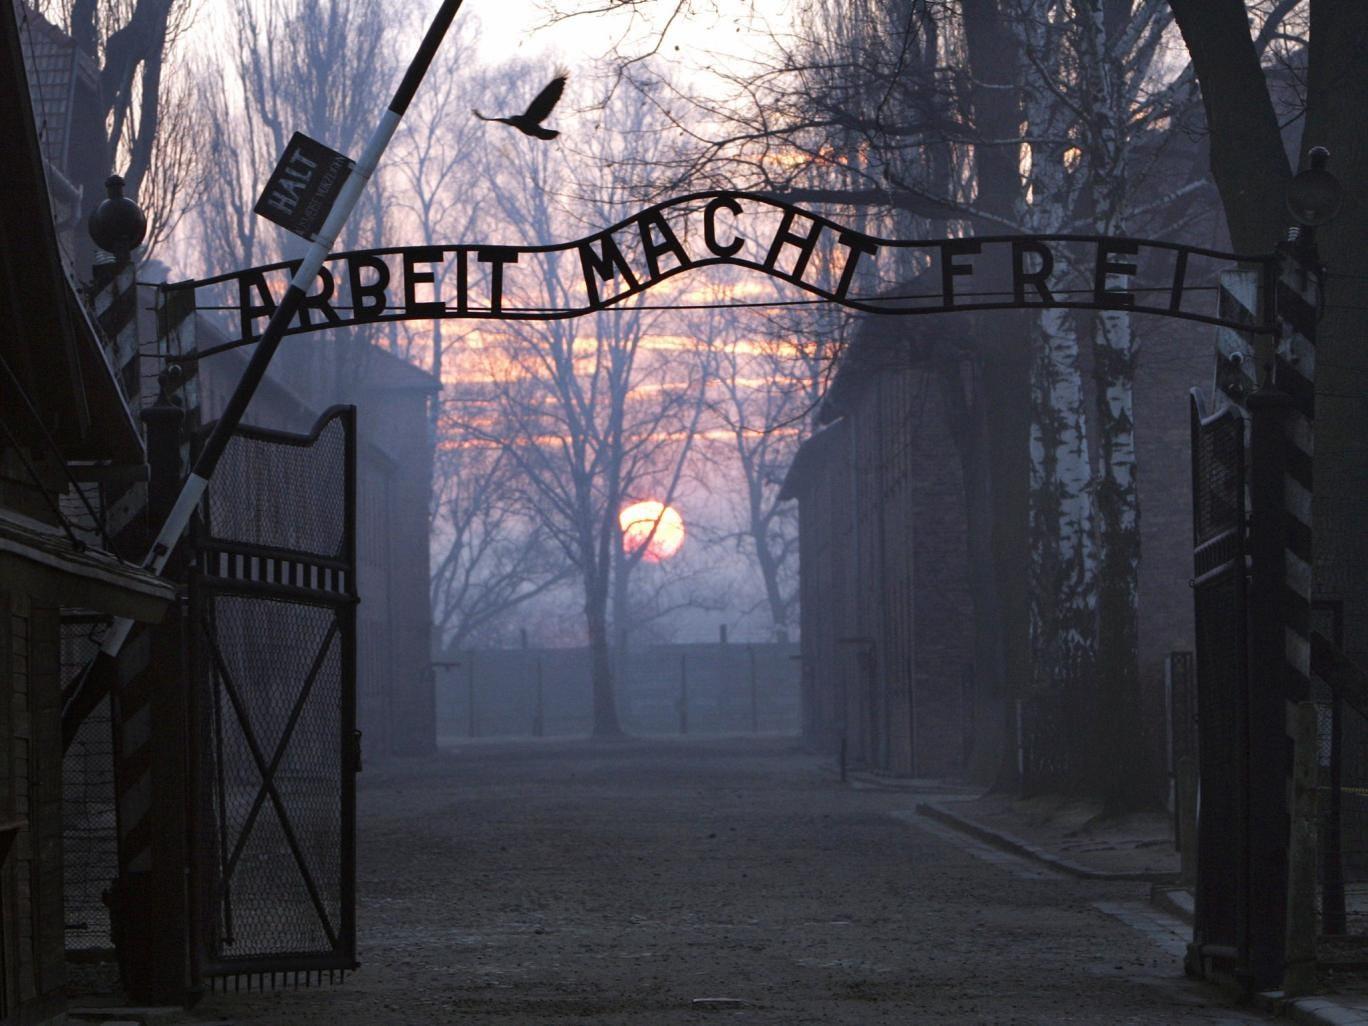 At least 1.1million prisoners died at Auschwitz between 1942 and 1944, around 90 percent of them were Jewish.